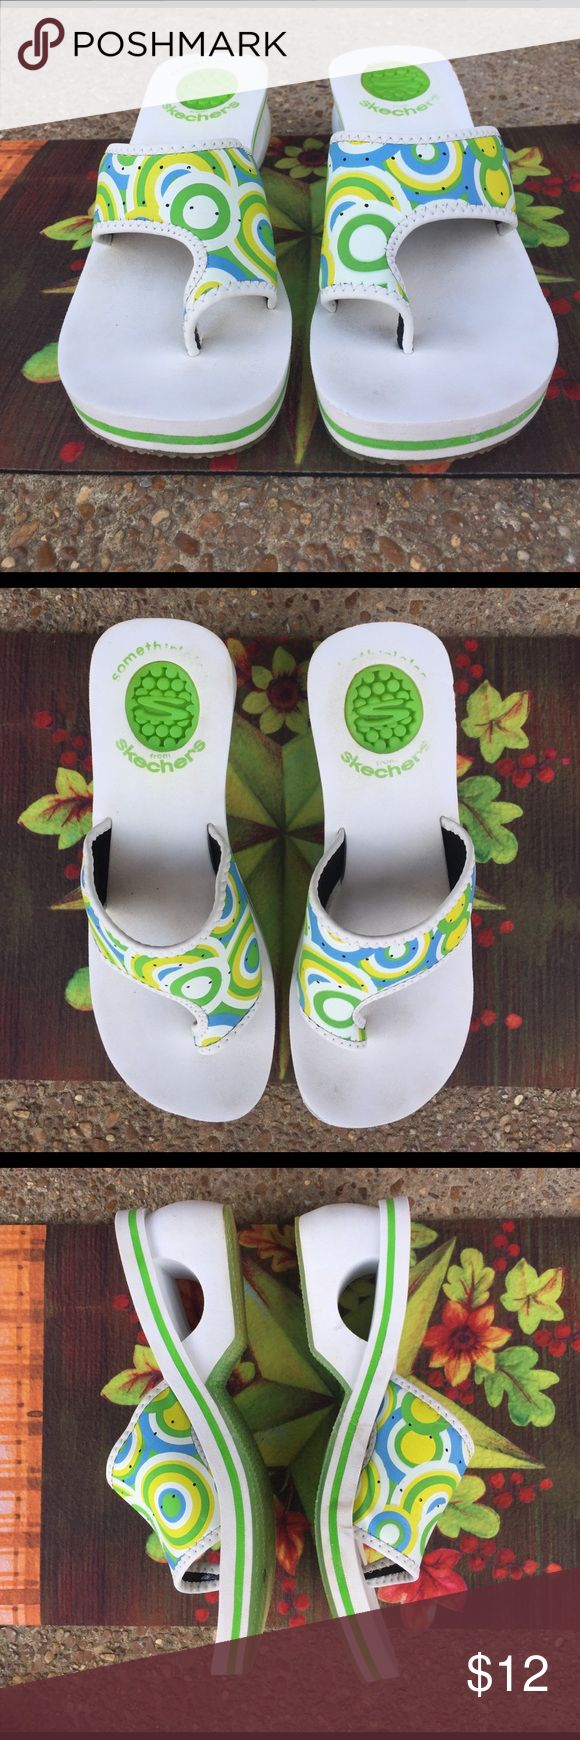 Flip flops Pretty multi color flip flops just thinking of warmer weather Skechers Shoes Sandals